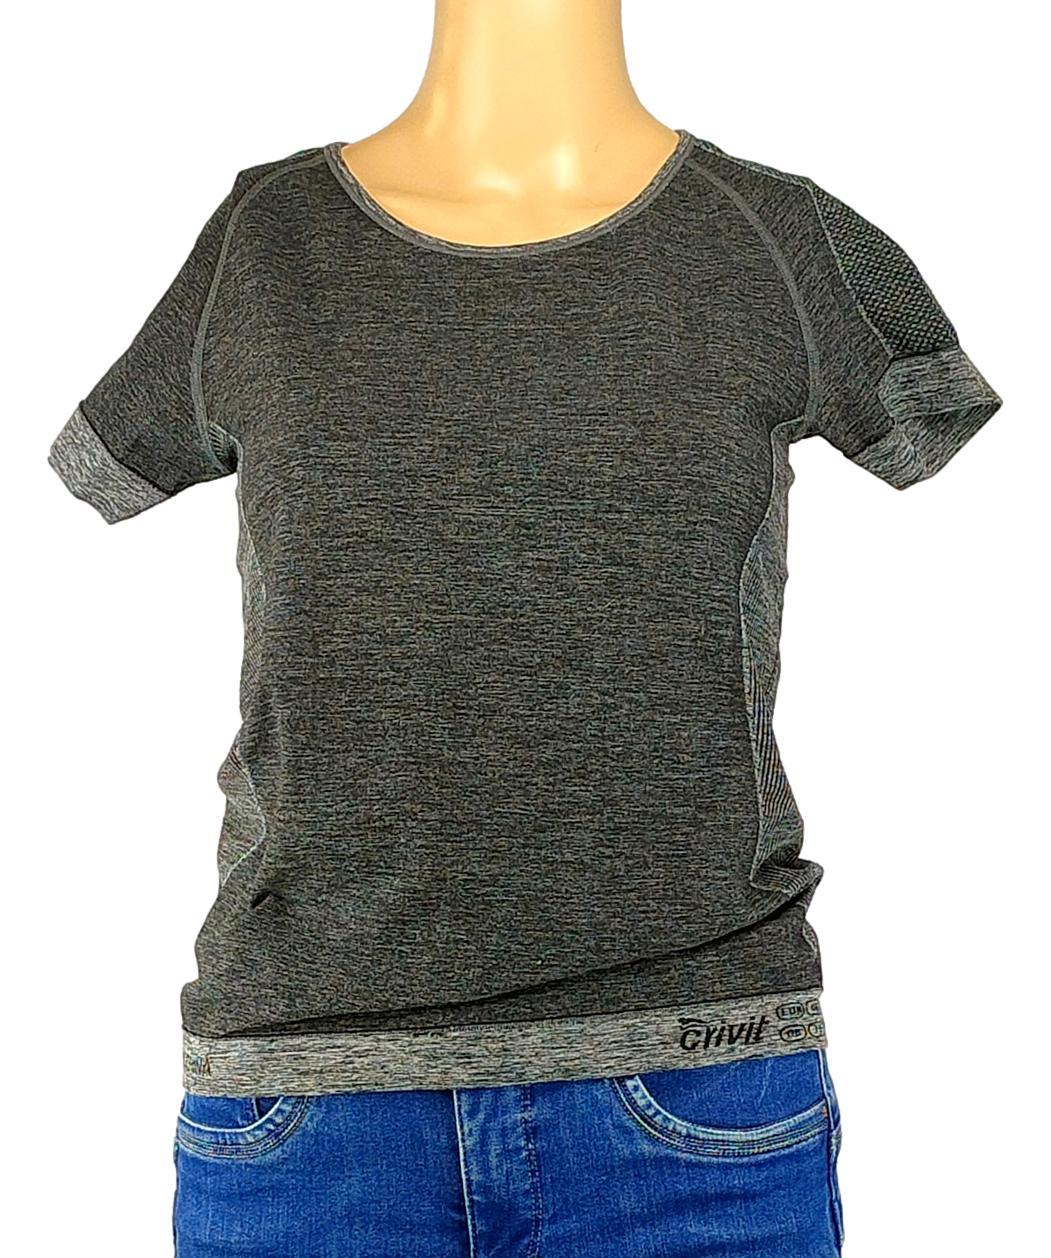 T-shirt Crivit - taille 36